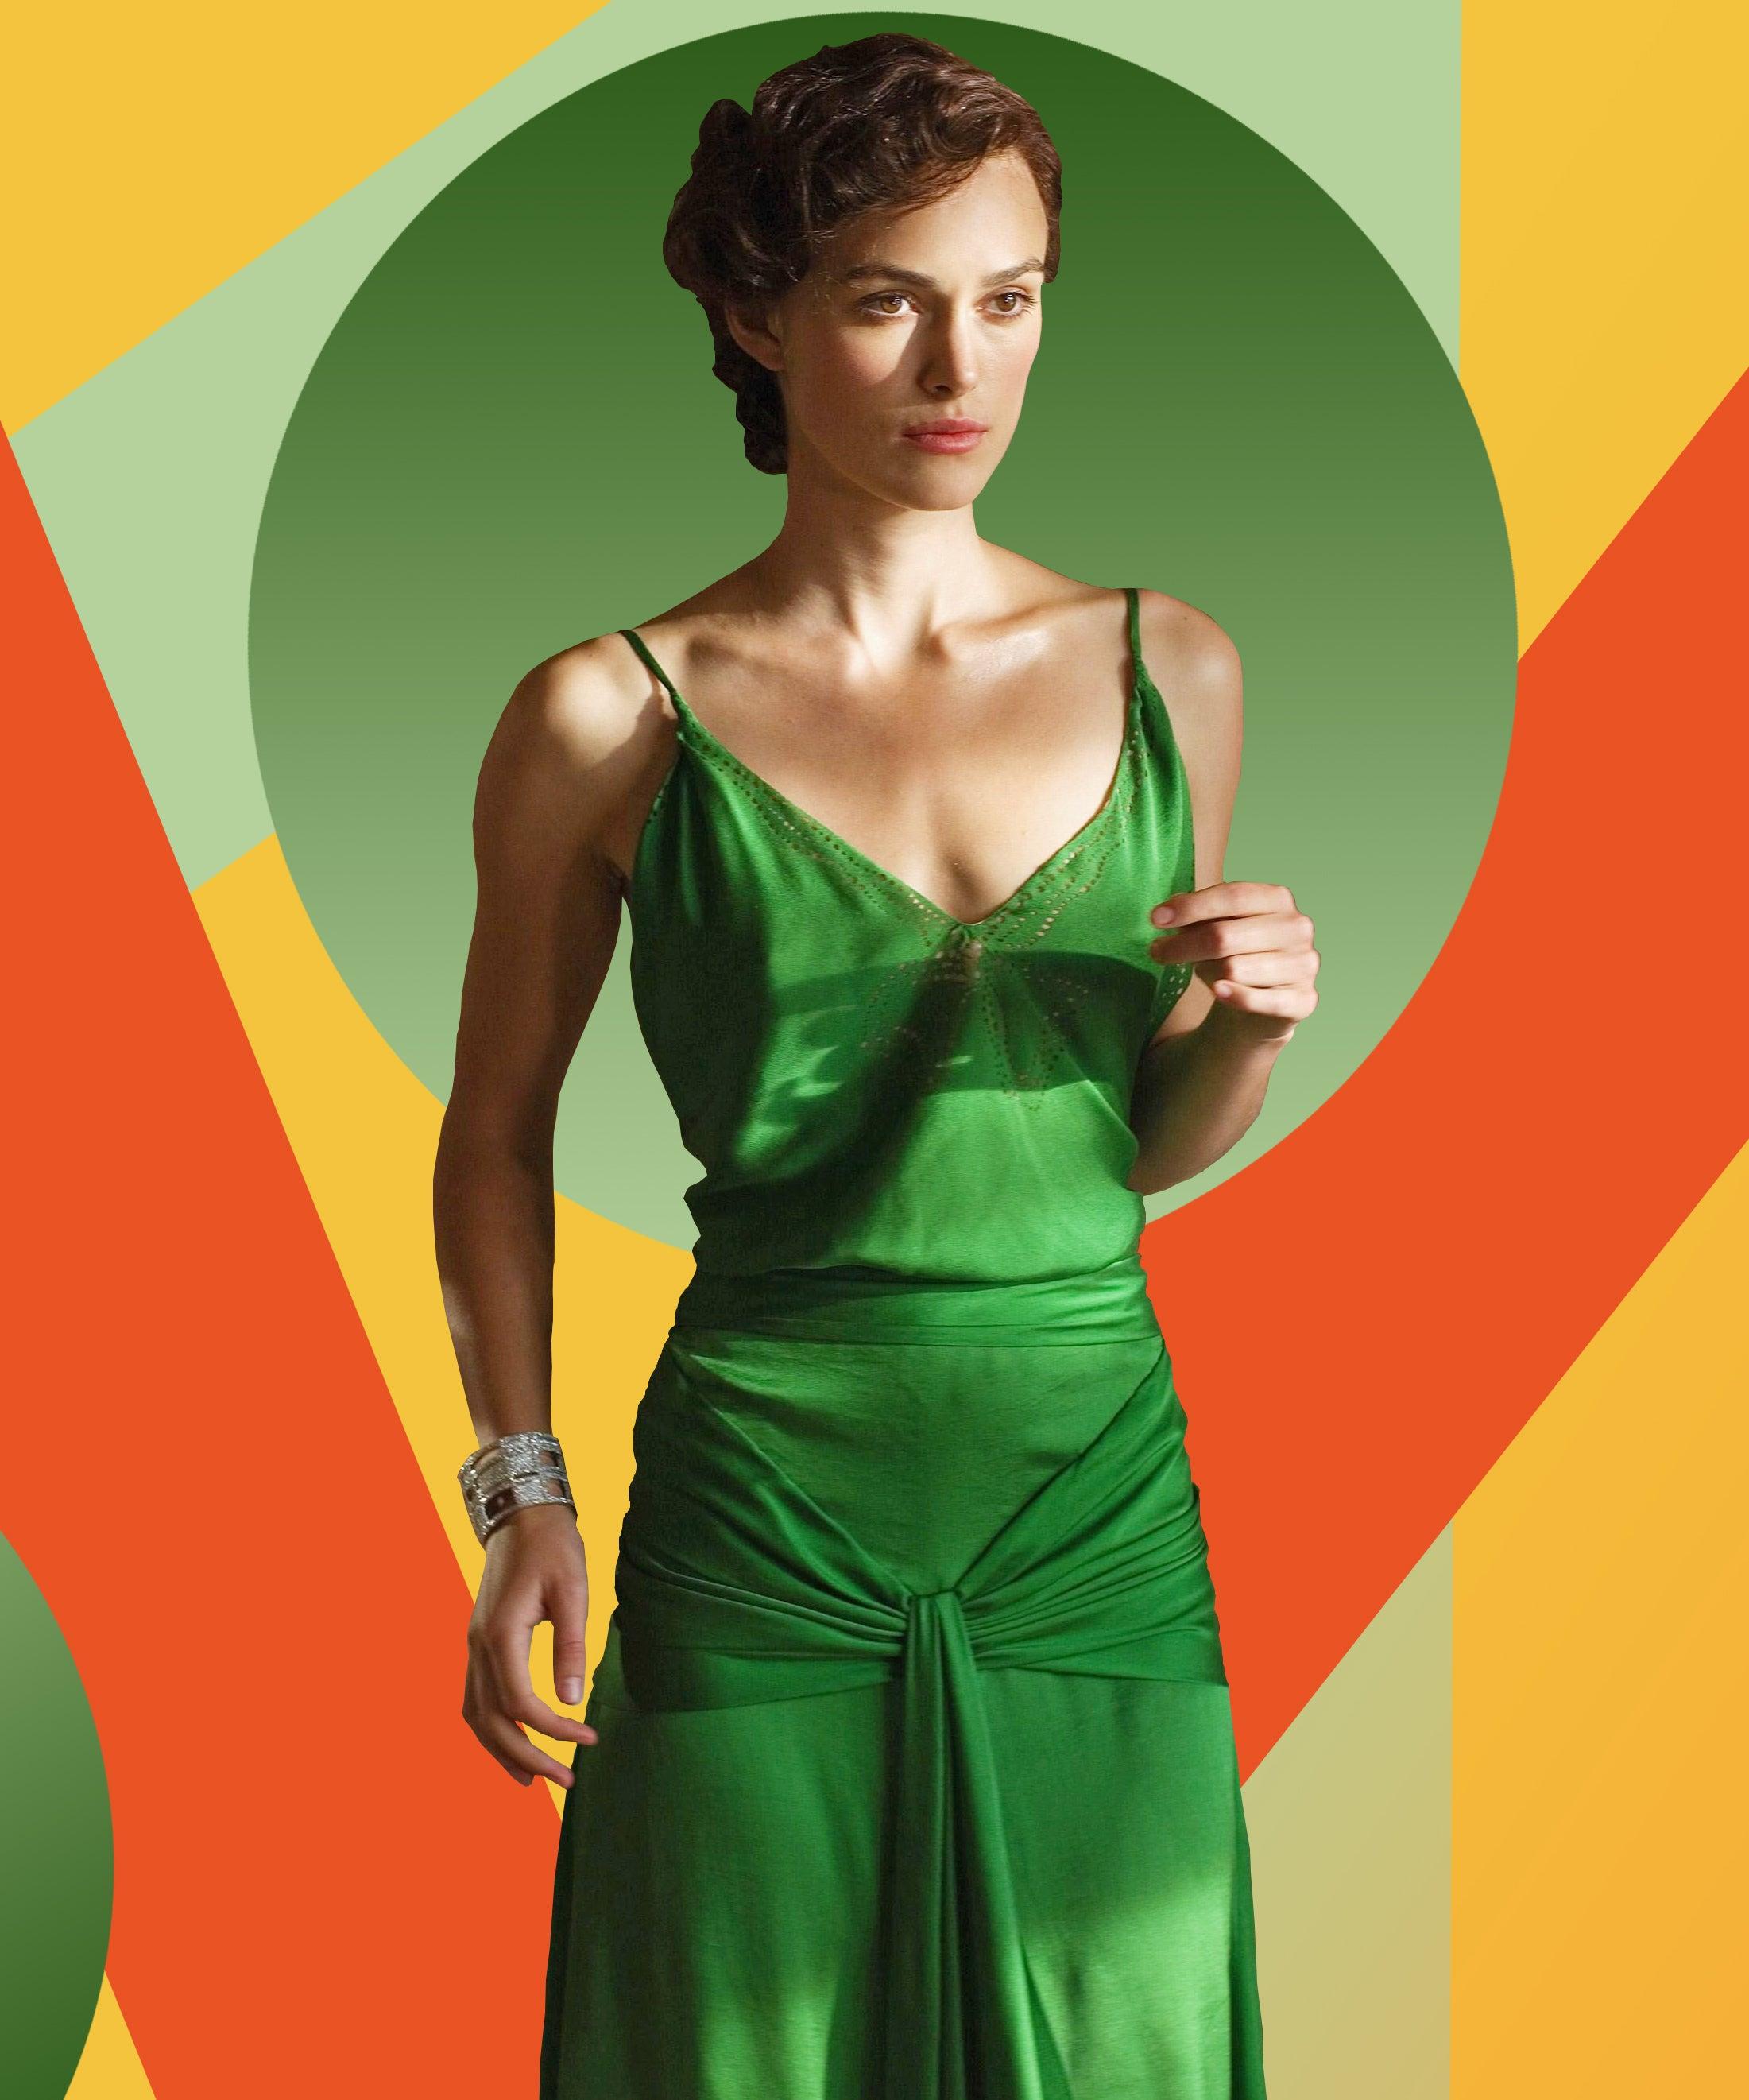 The Subversive Allure Of A Good Green Dress